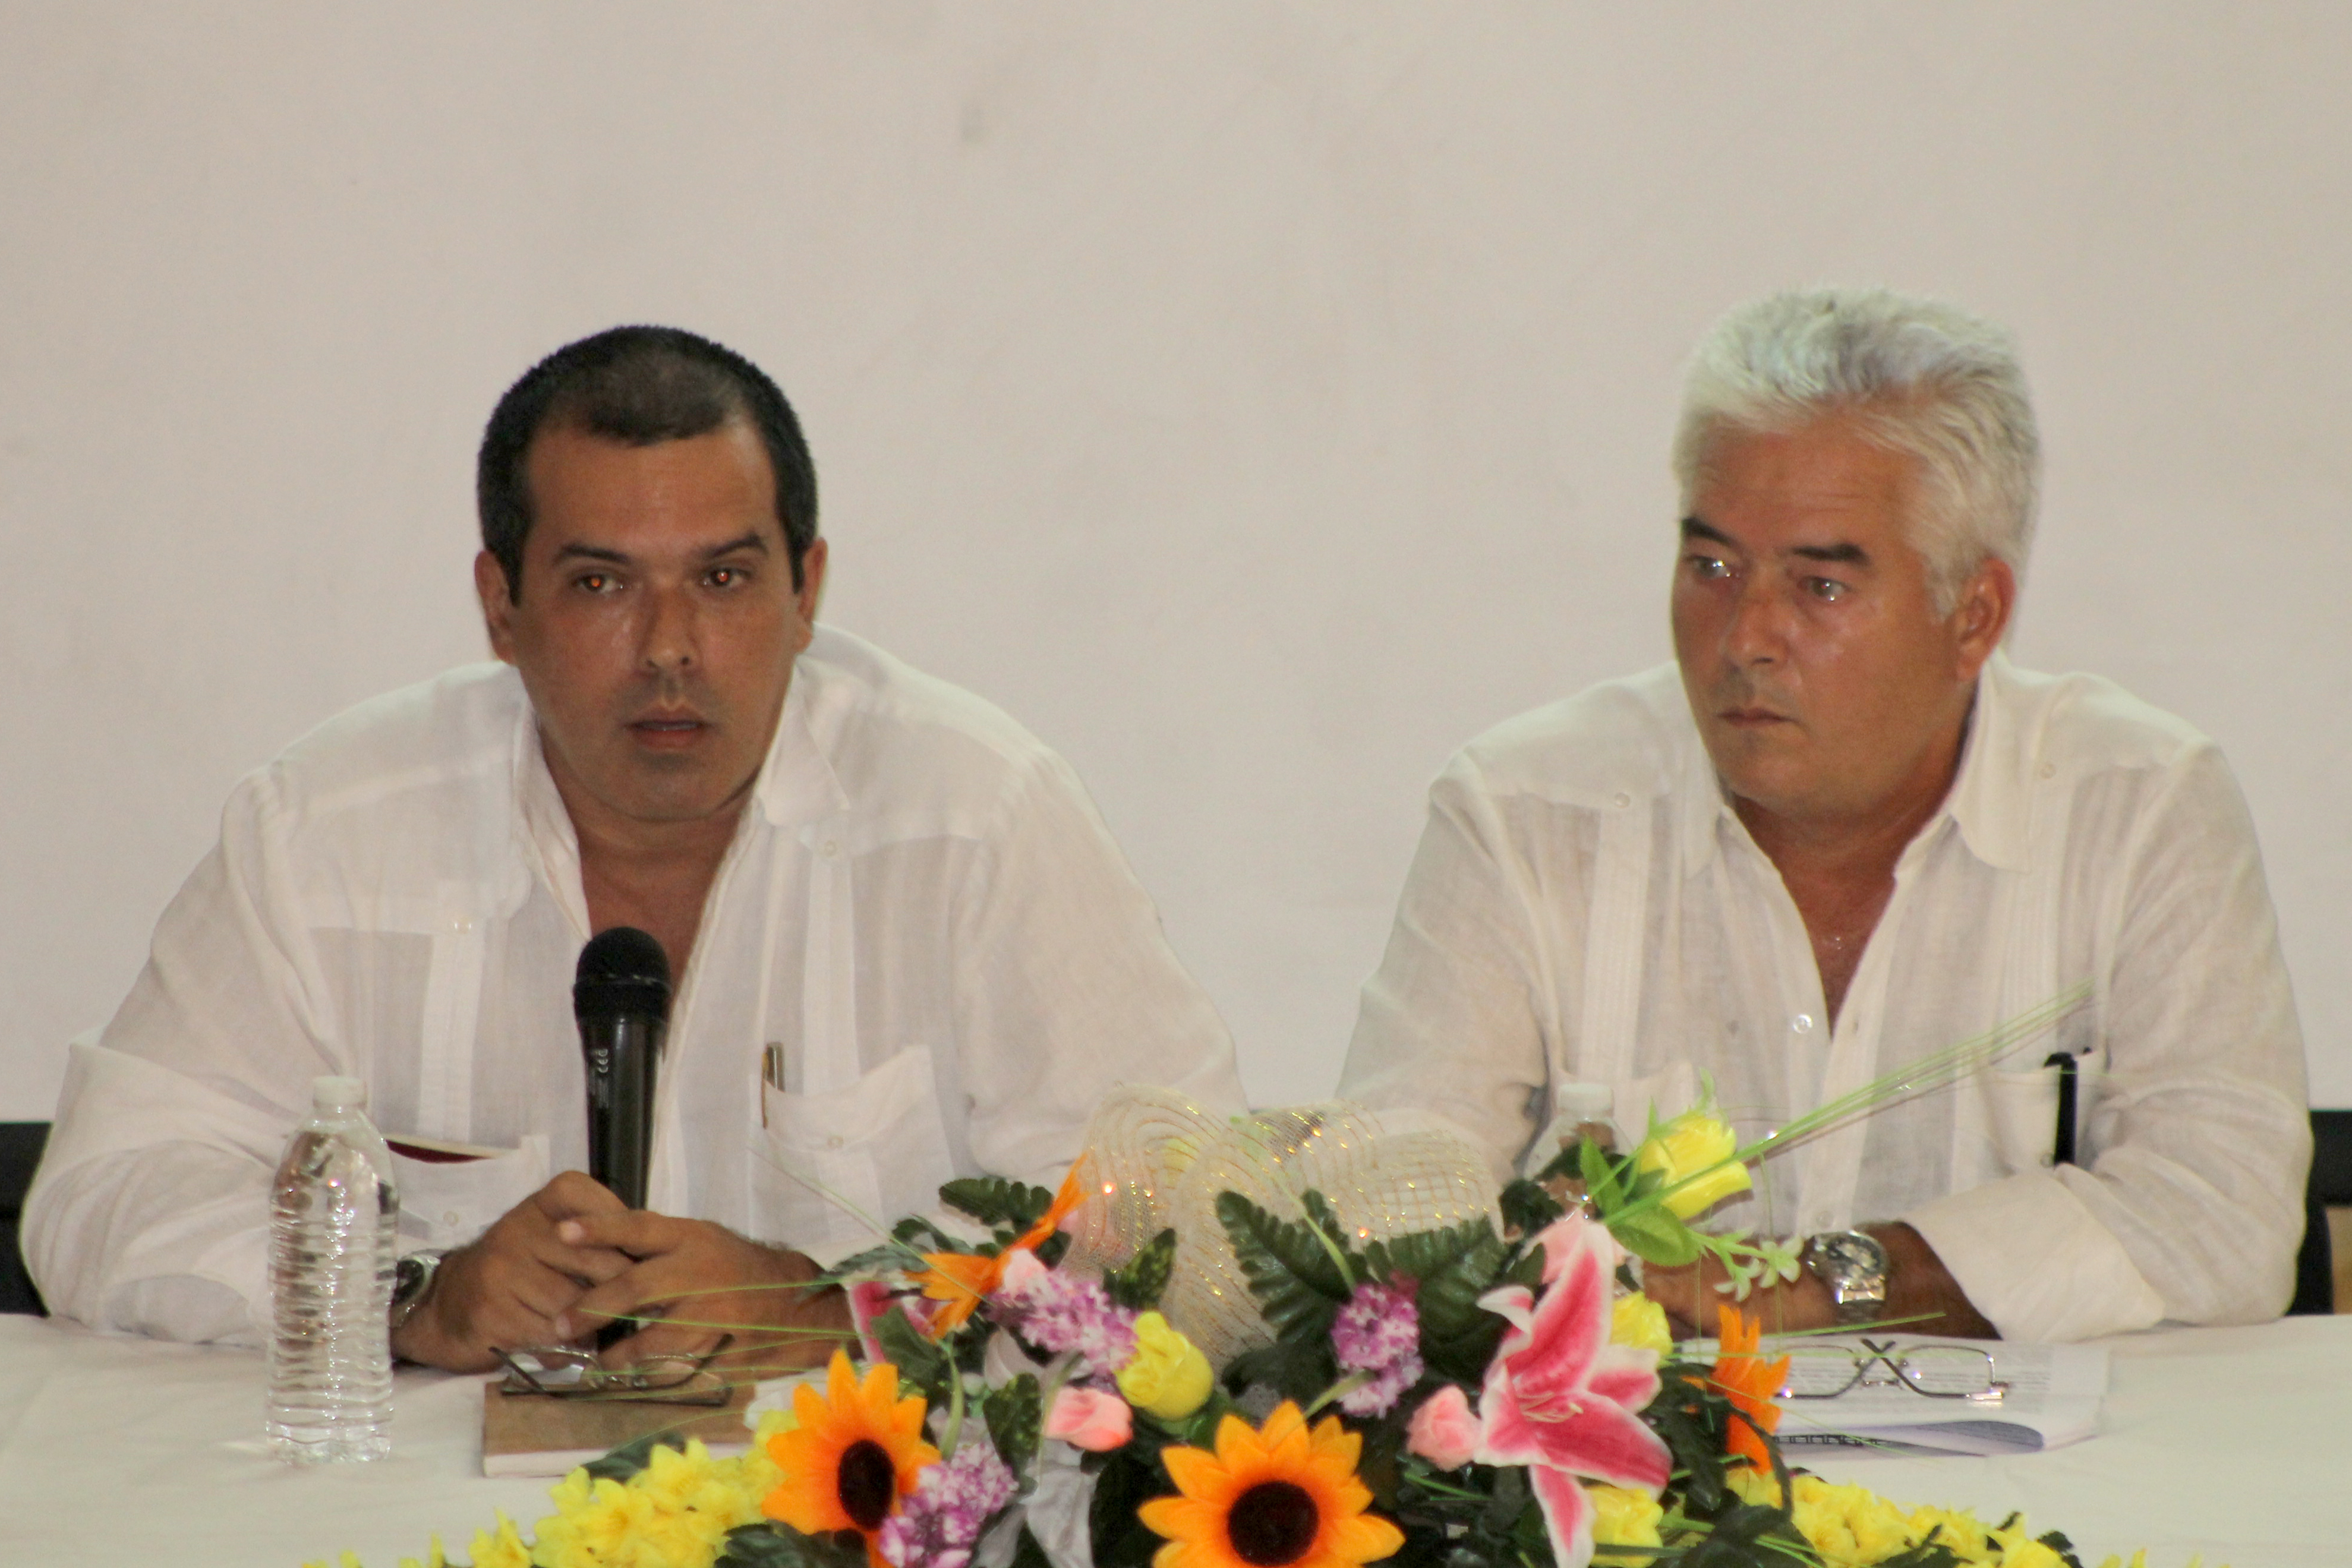 Luis Enrique González, Presidente de la Prensa Latina y Eduardo Rodríguez Baz, Vicepresidente de la Prensa Latina. Foto Diario Co Latino / Jorge Rivera.